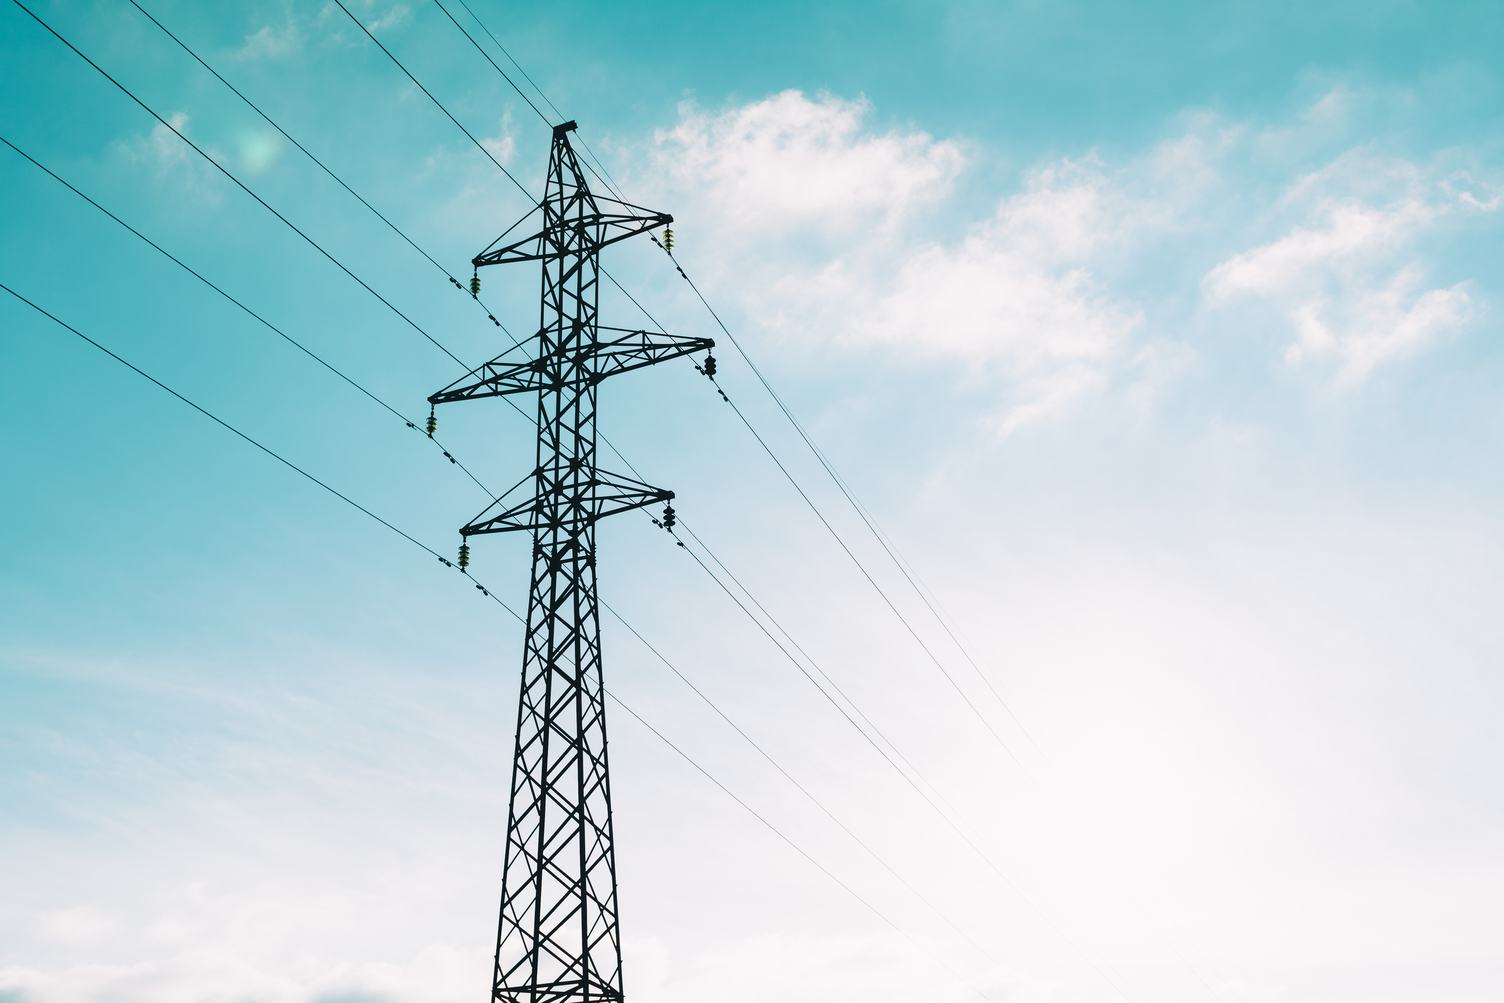 High Voltage Pole against Blue Sky